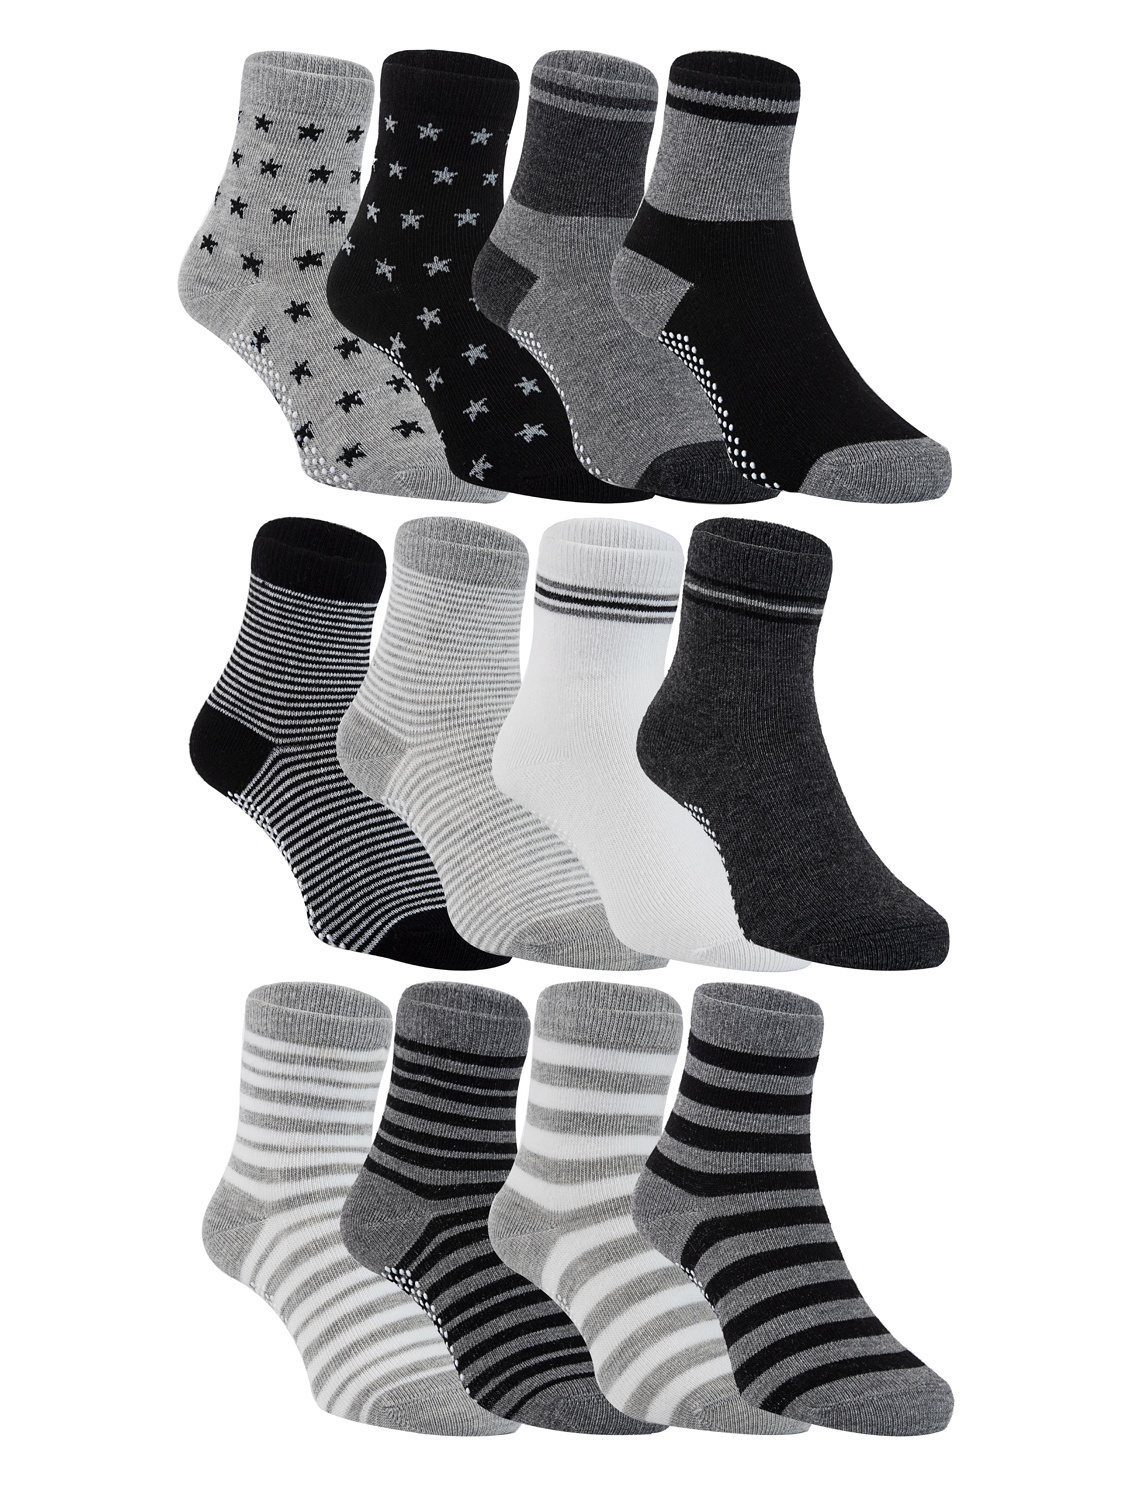 Lovely Annie Unisex Children 6 Pairs Pack Non-Skid Cotton Socks Random Color